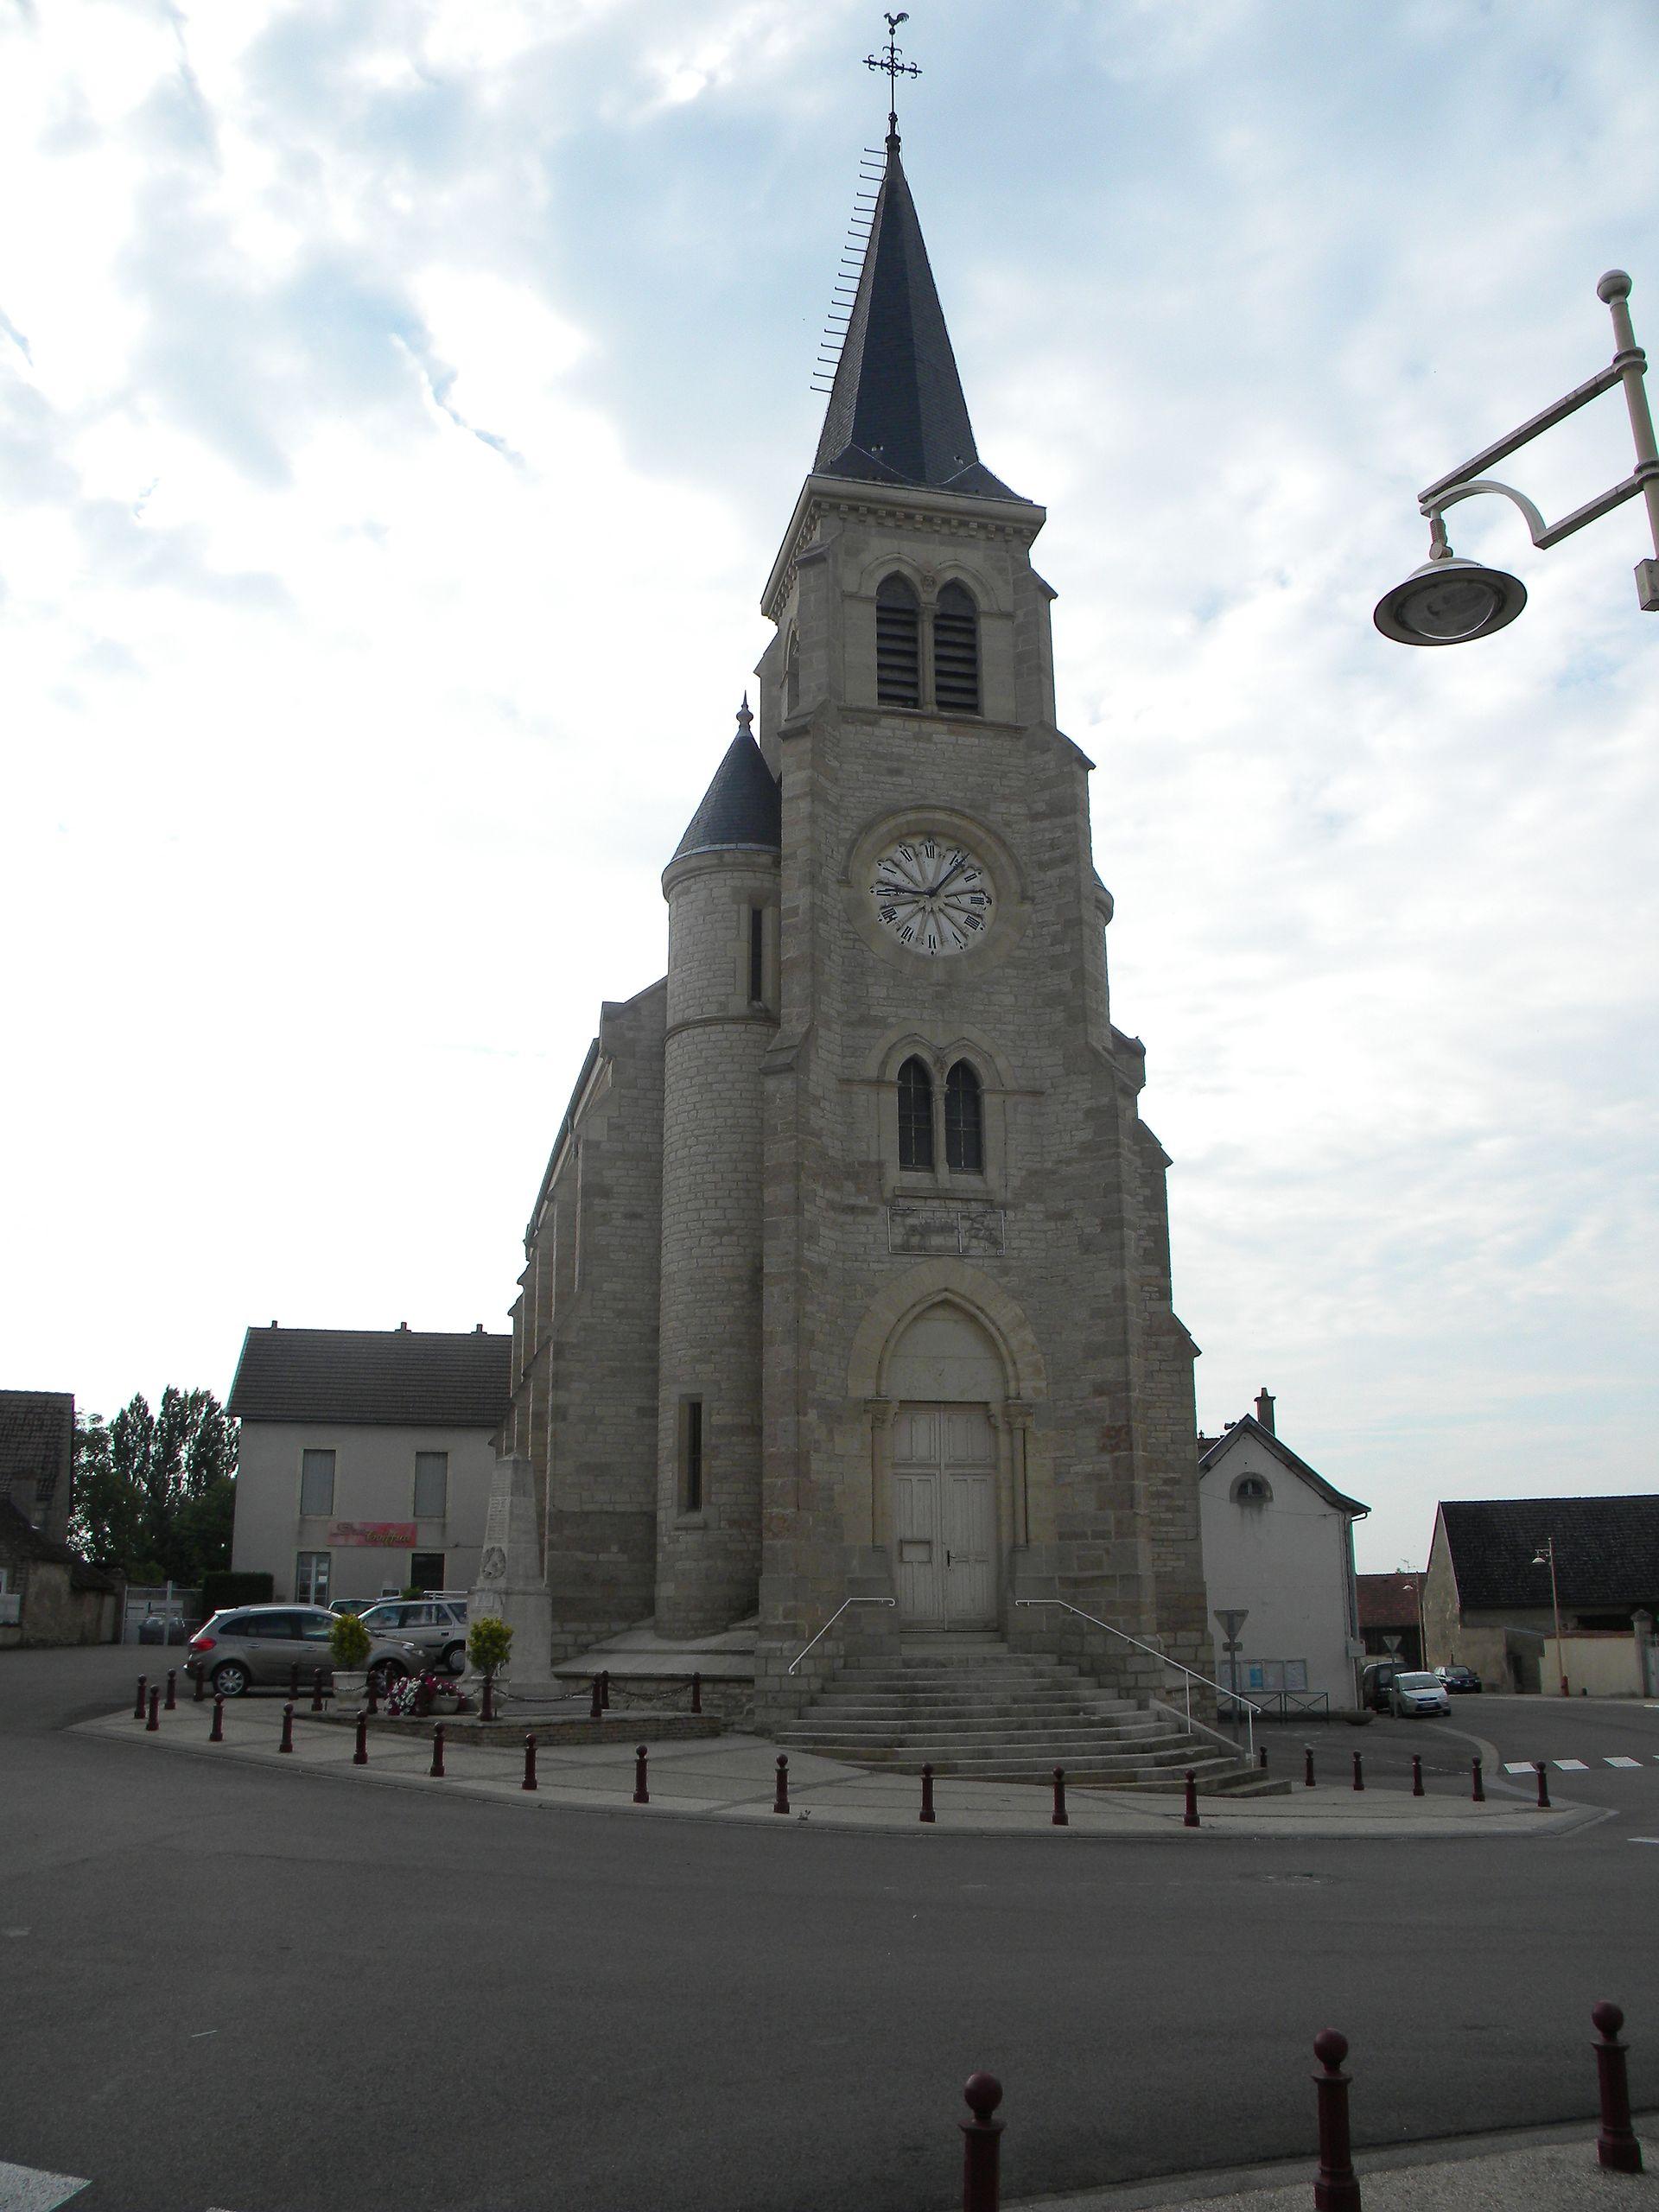 saulon la chapelle wikipedia